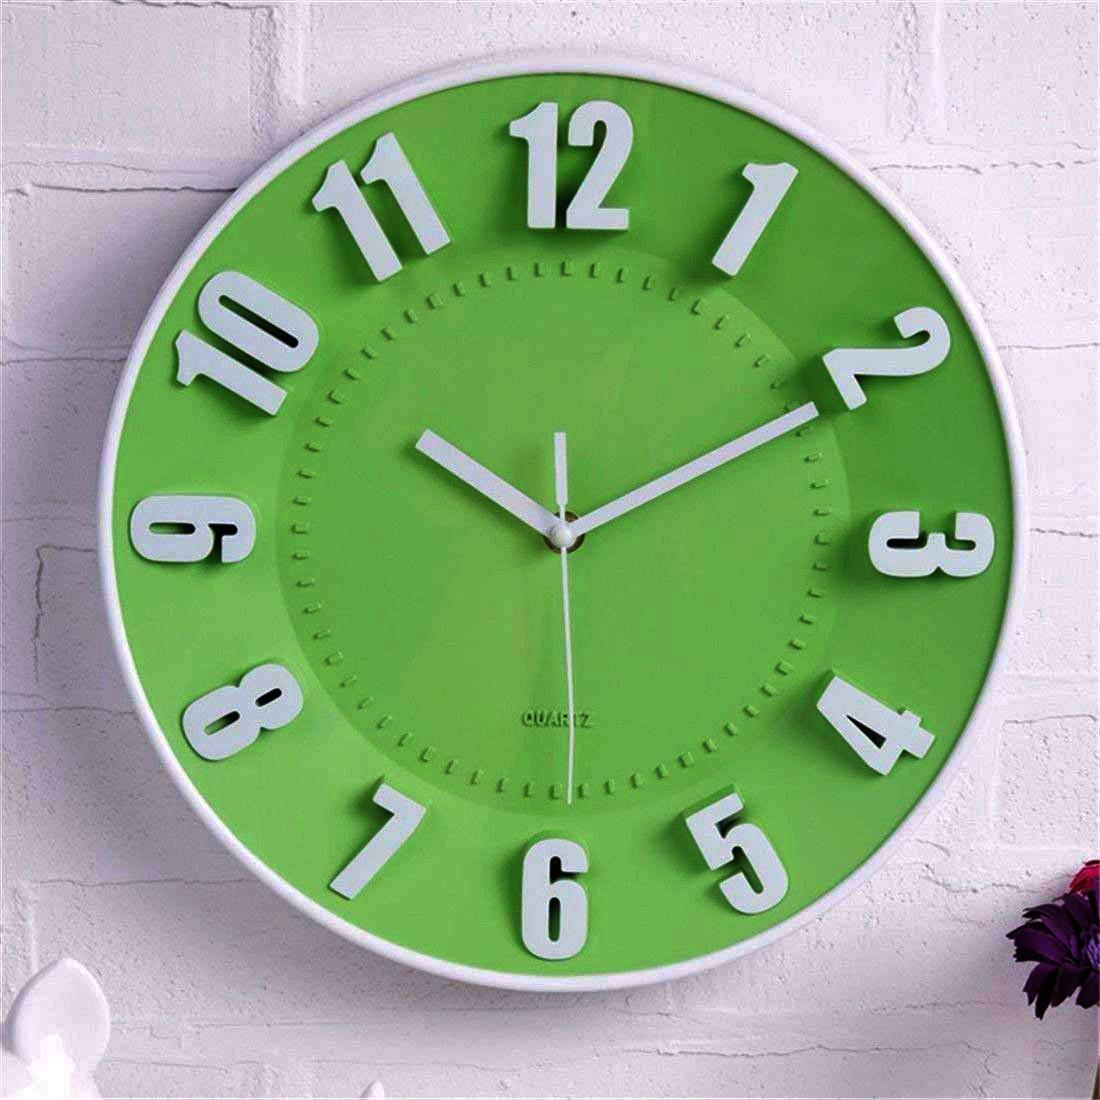 Buy Wall Alarm Clocks Online Best Price In Pakistan Daraz